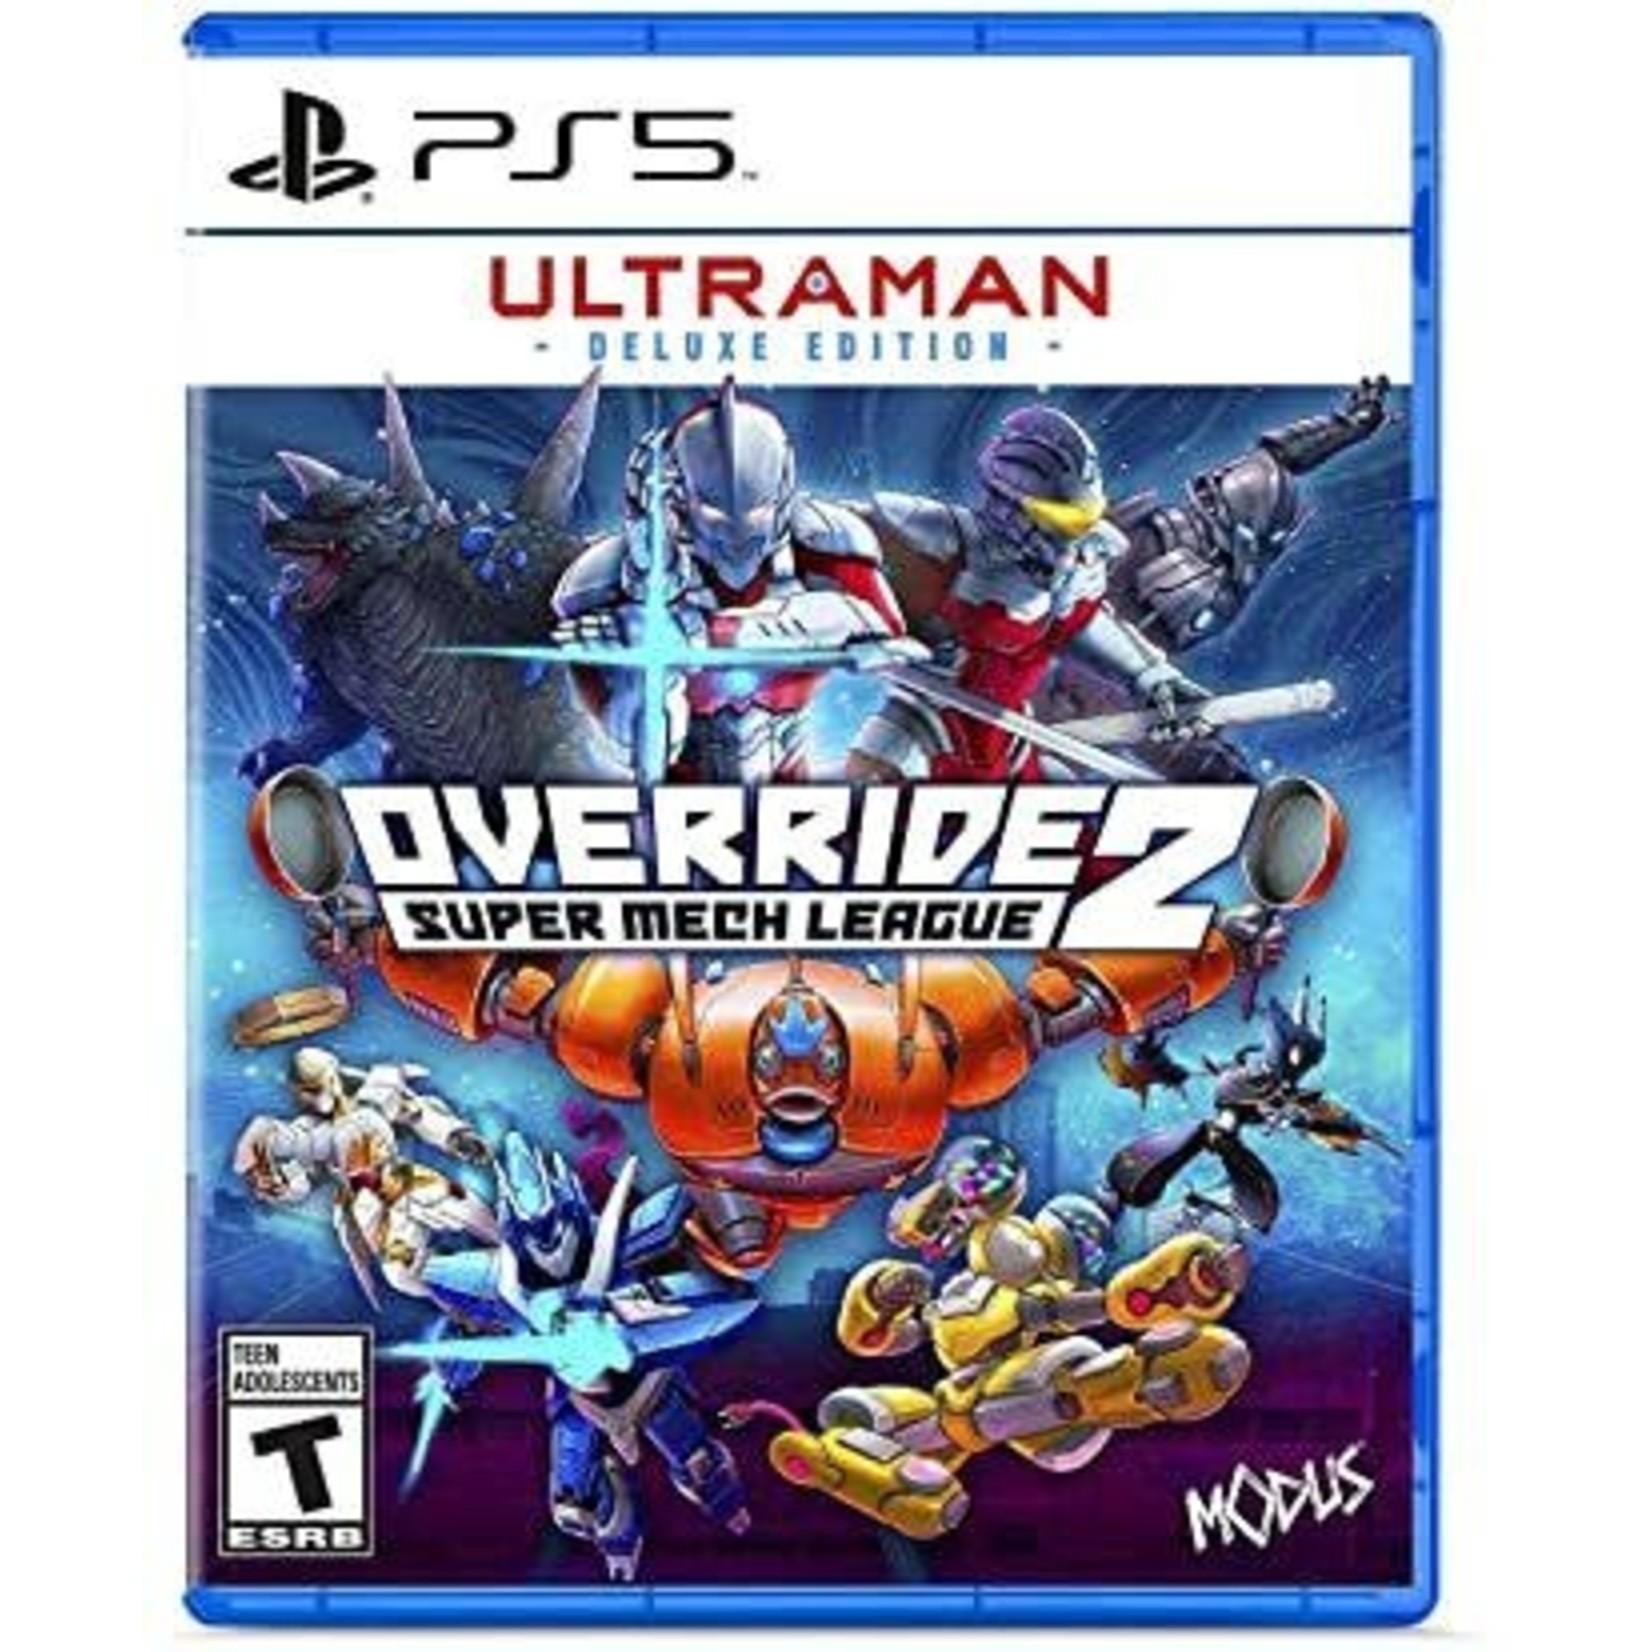 PS5U-Override 2 Super Mech League Ultraman Deluxe Edition